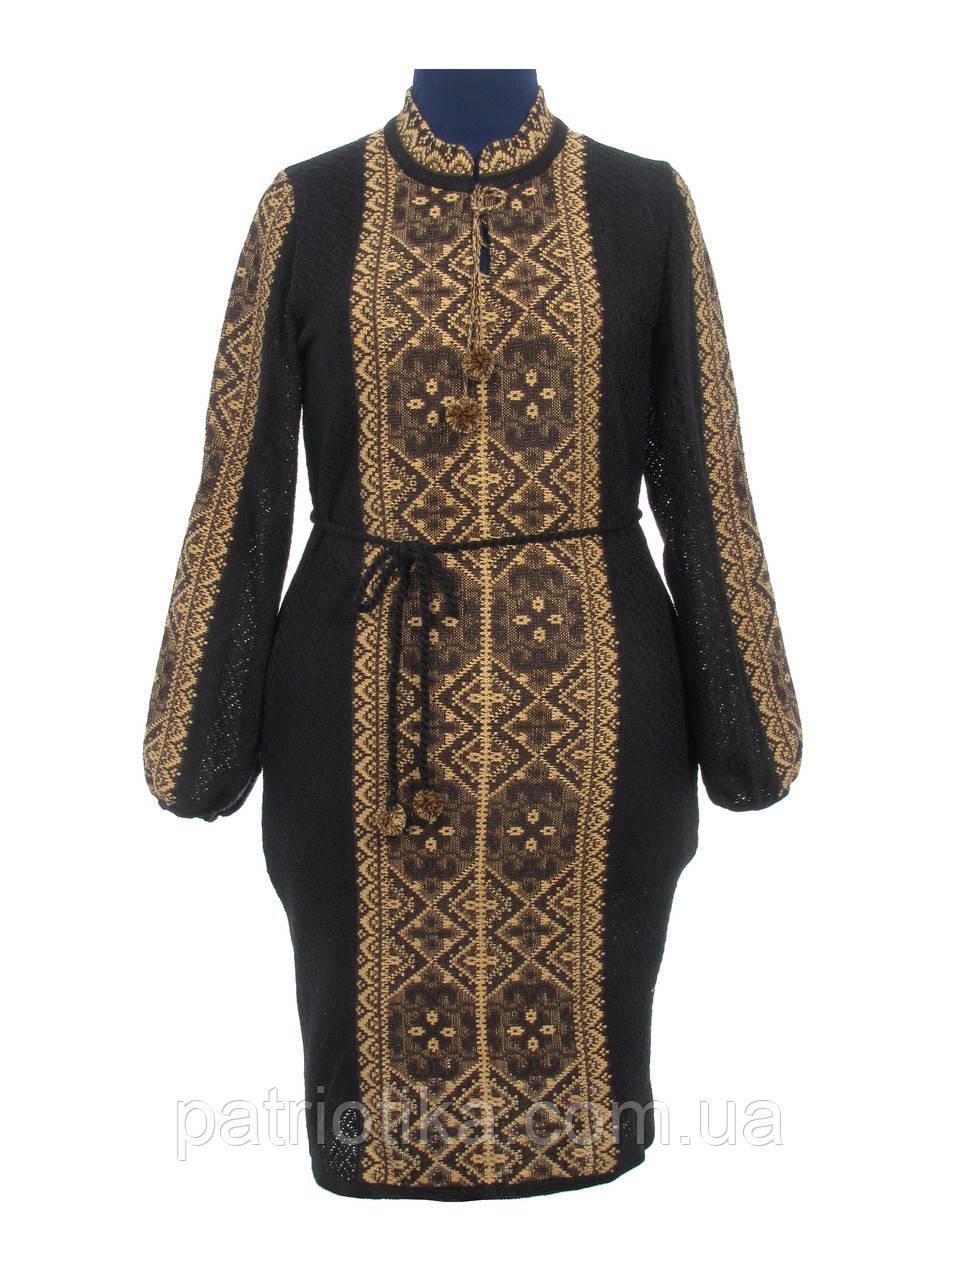 Вязаное платье Влада коричневая х/б   В'язане плаття Влада коричнева х/б